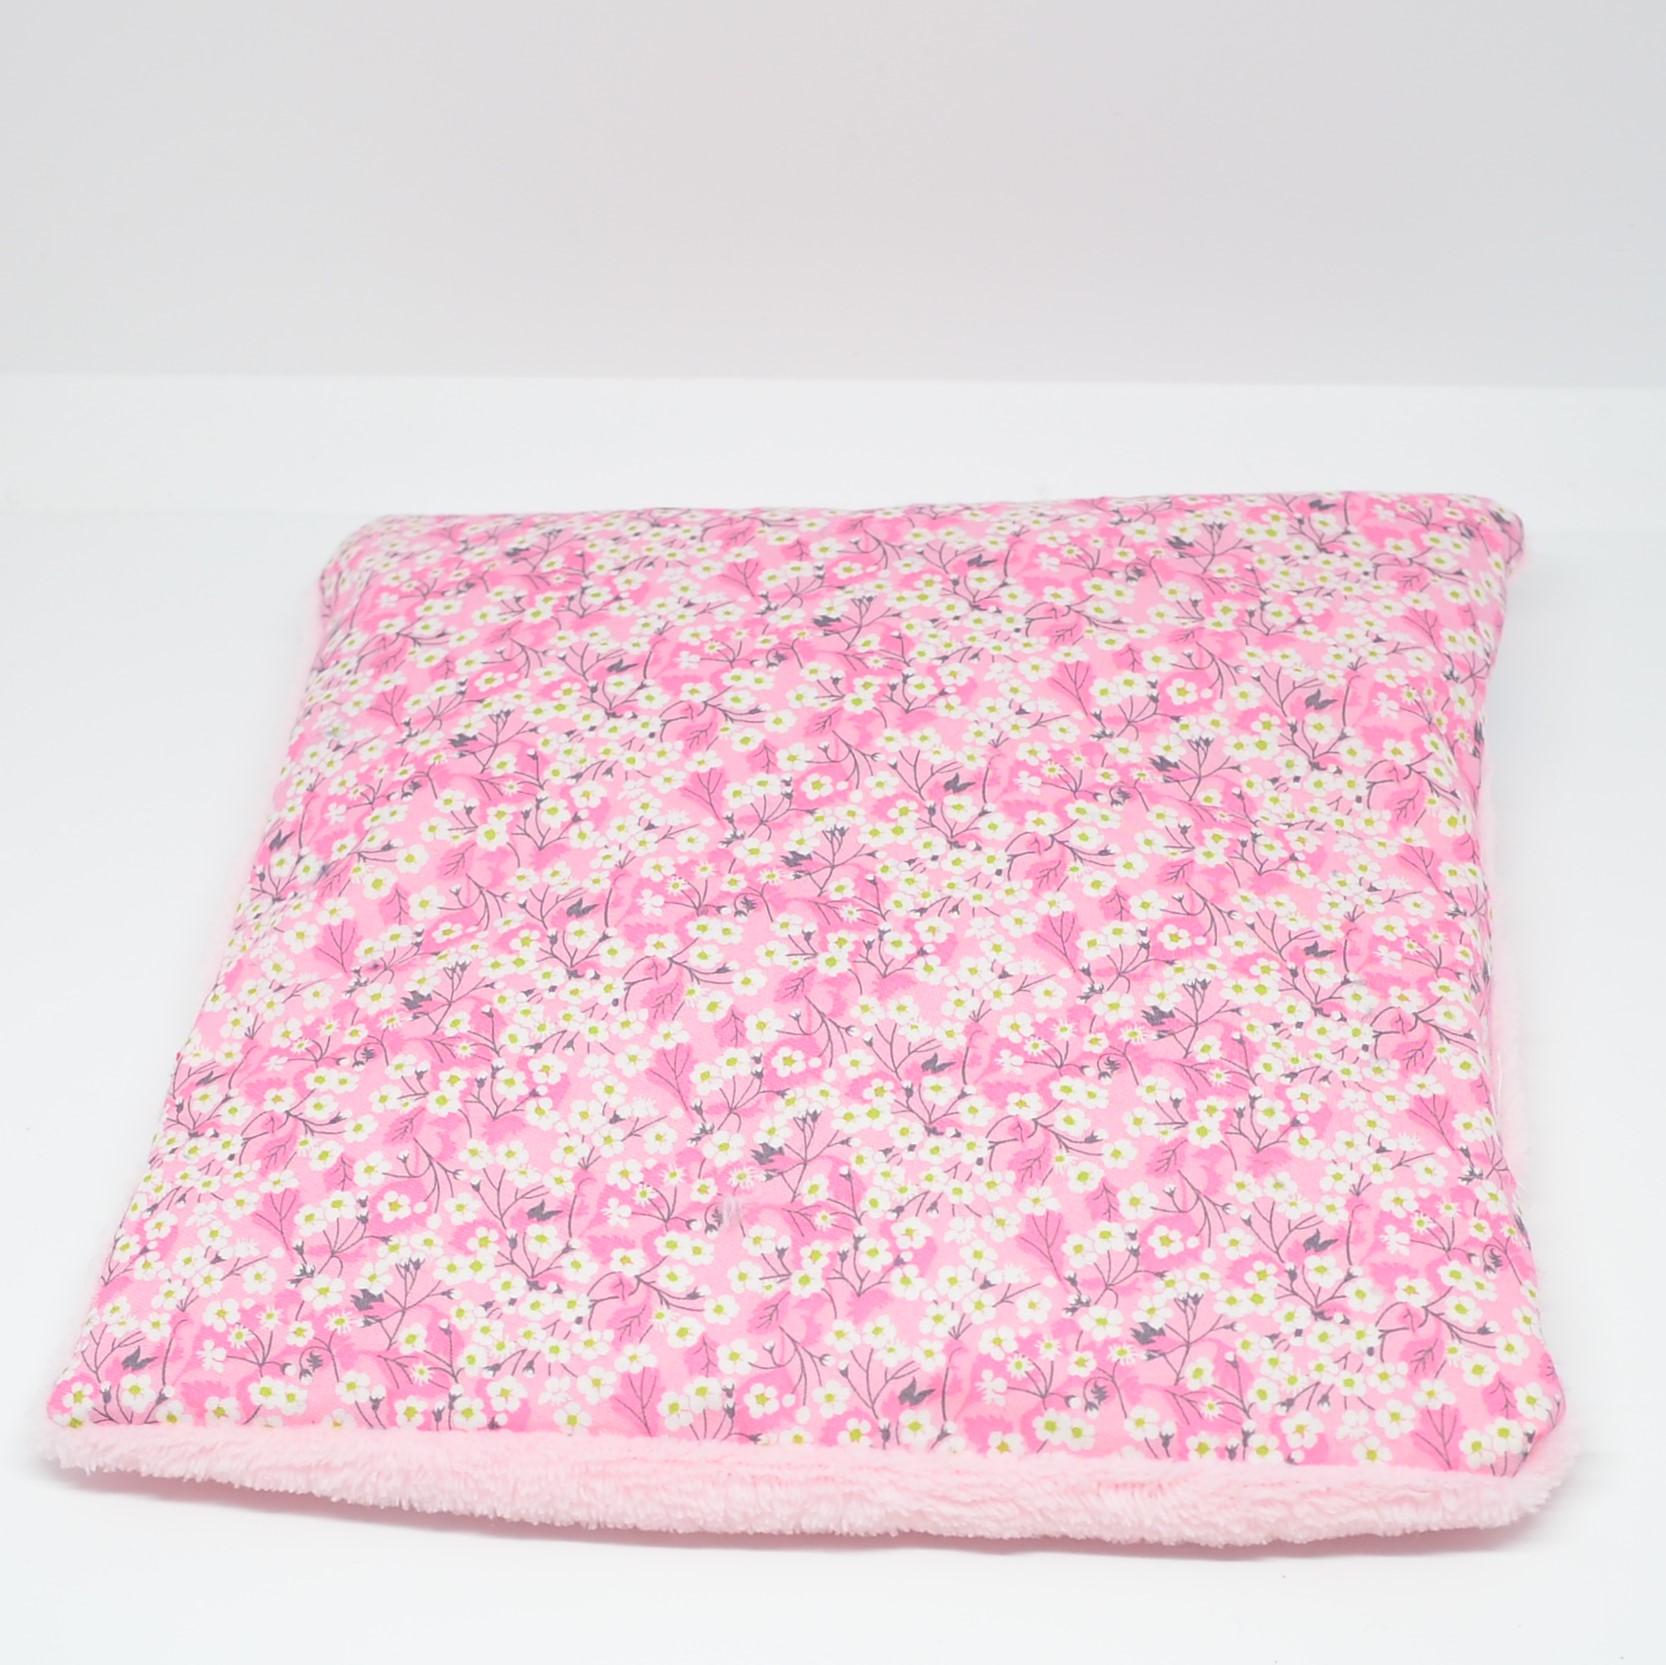 Bouillotte sèche Mitsi valeria rose--9995747221560